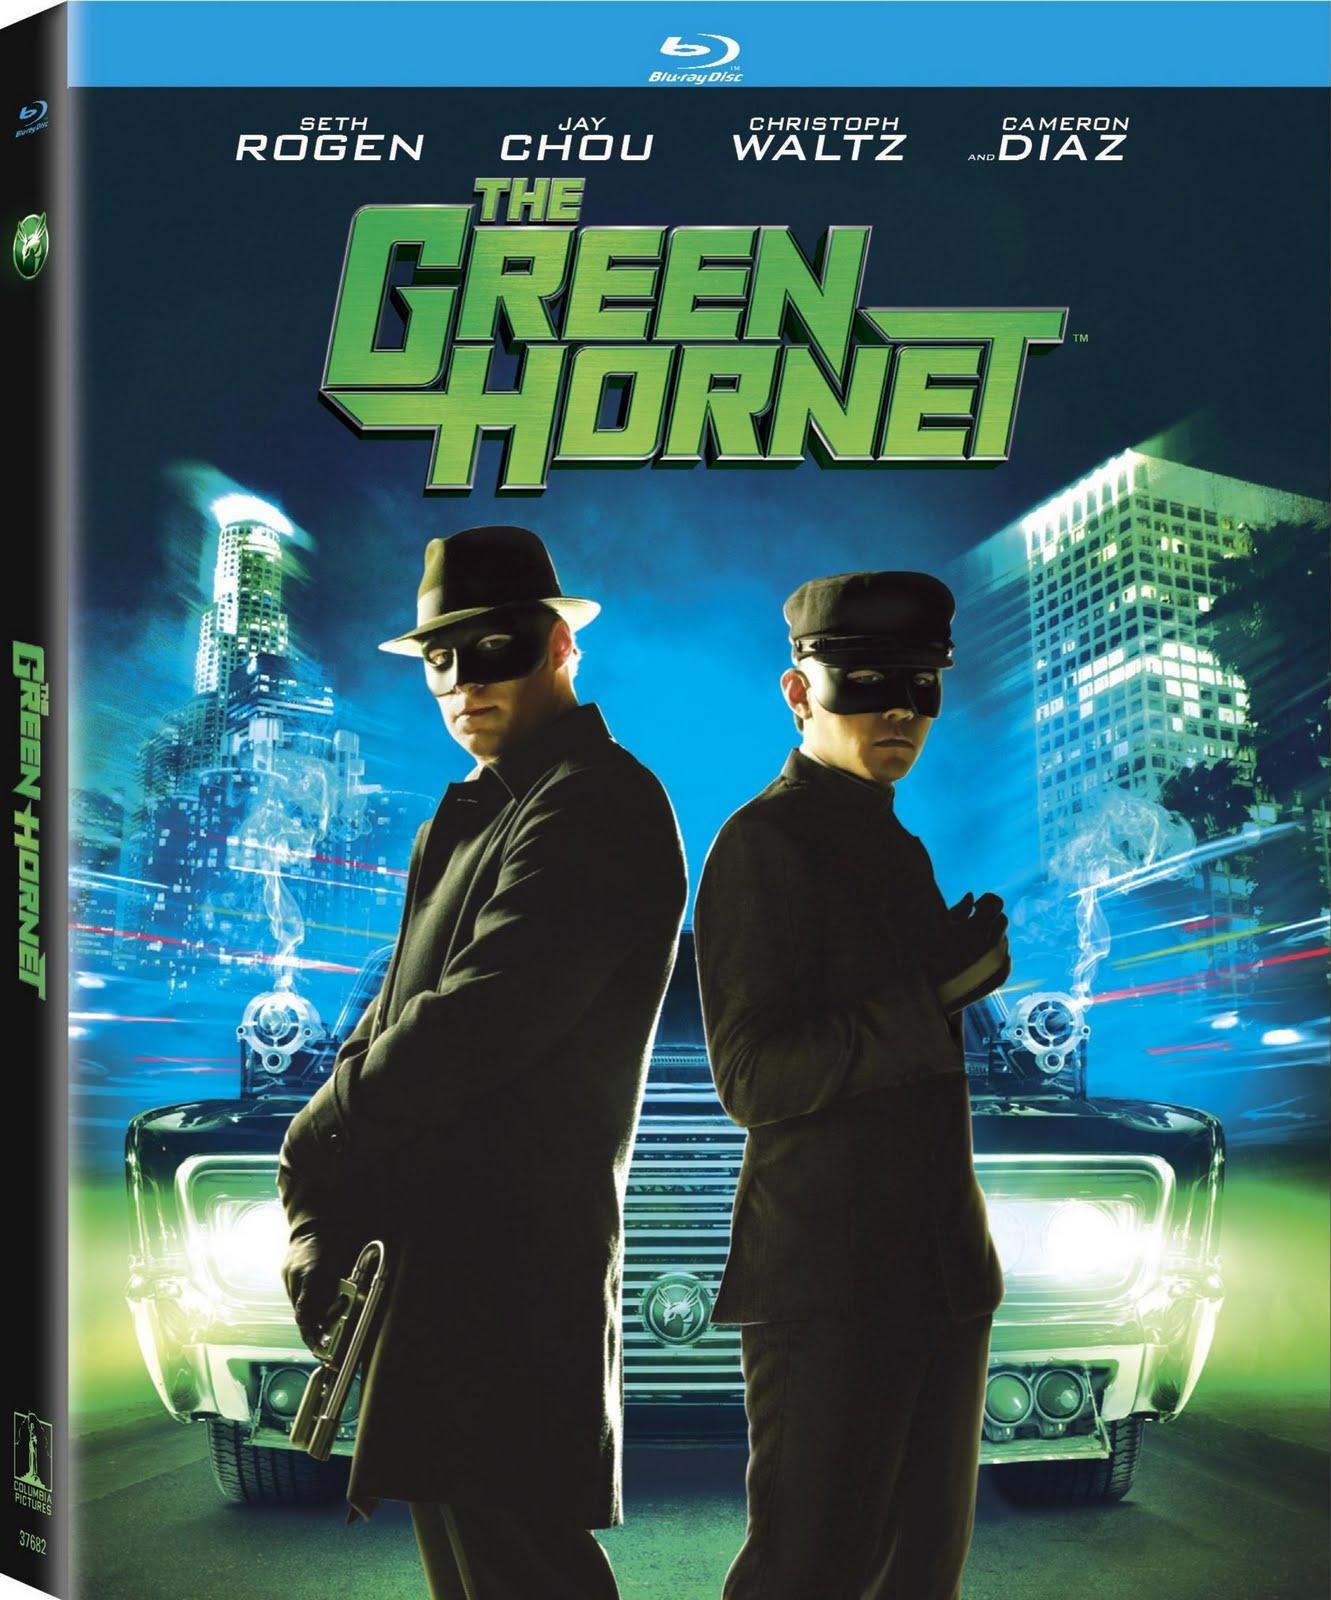 http://2.bp.blogspot.com/-67vc7EgP-Zg/TZiwS-Mwi2I/AAAAAAAAA9E/1tqXaTUaQ0A/s1600/The_Green_Hornet.jpg